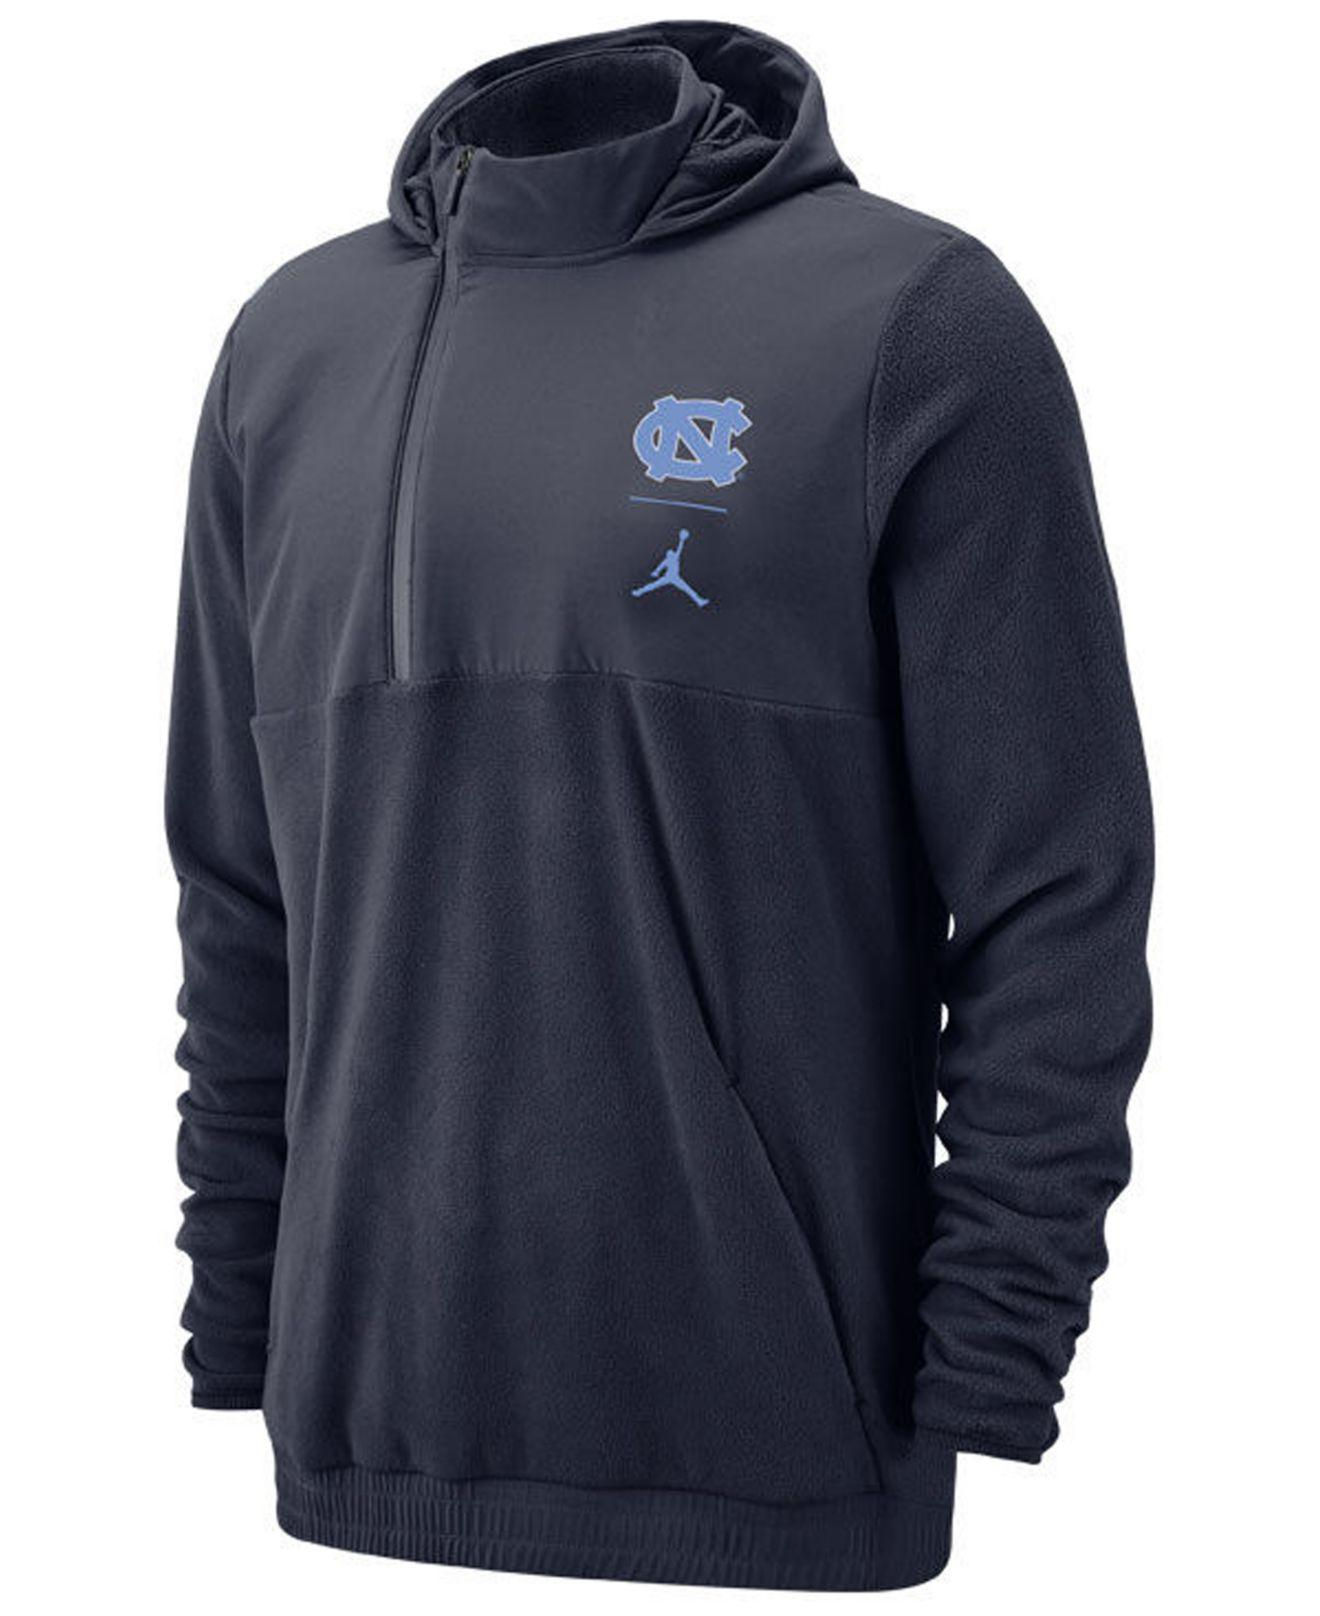 c9be95ef8d Lyst - Nike North Carolina Tar Heels Therma Sphere Max Jacket in ...